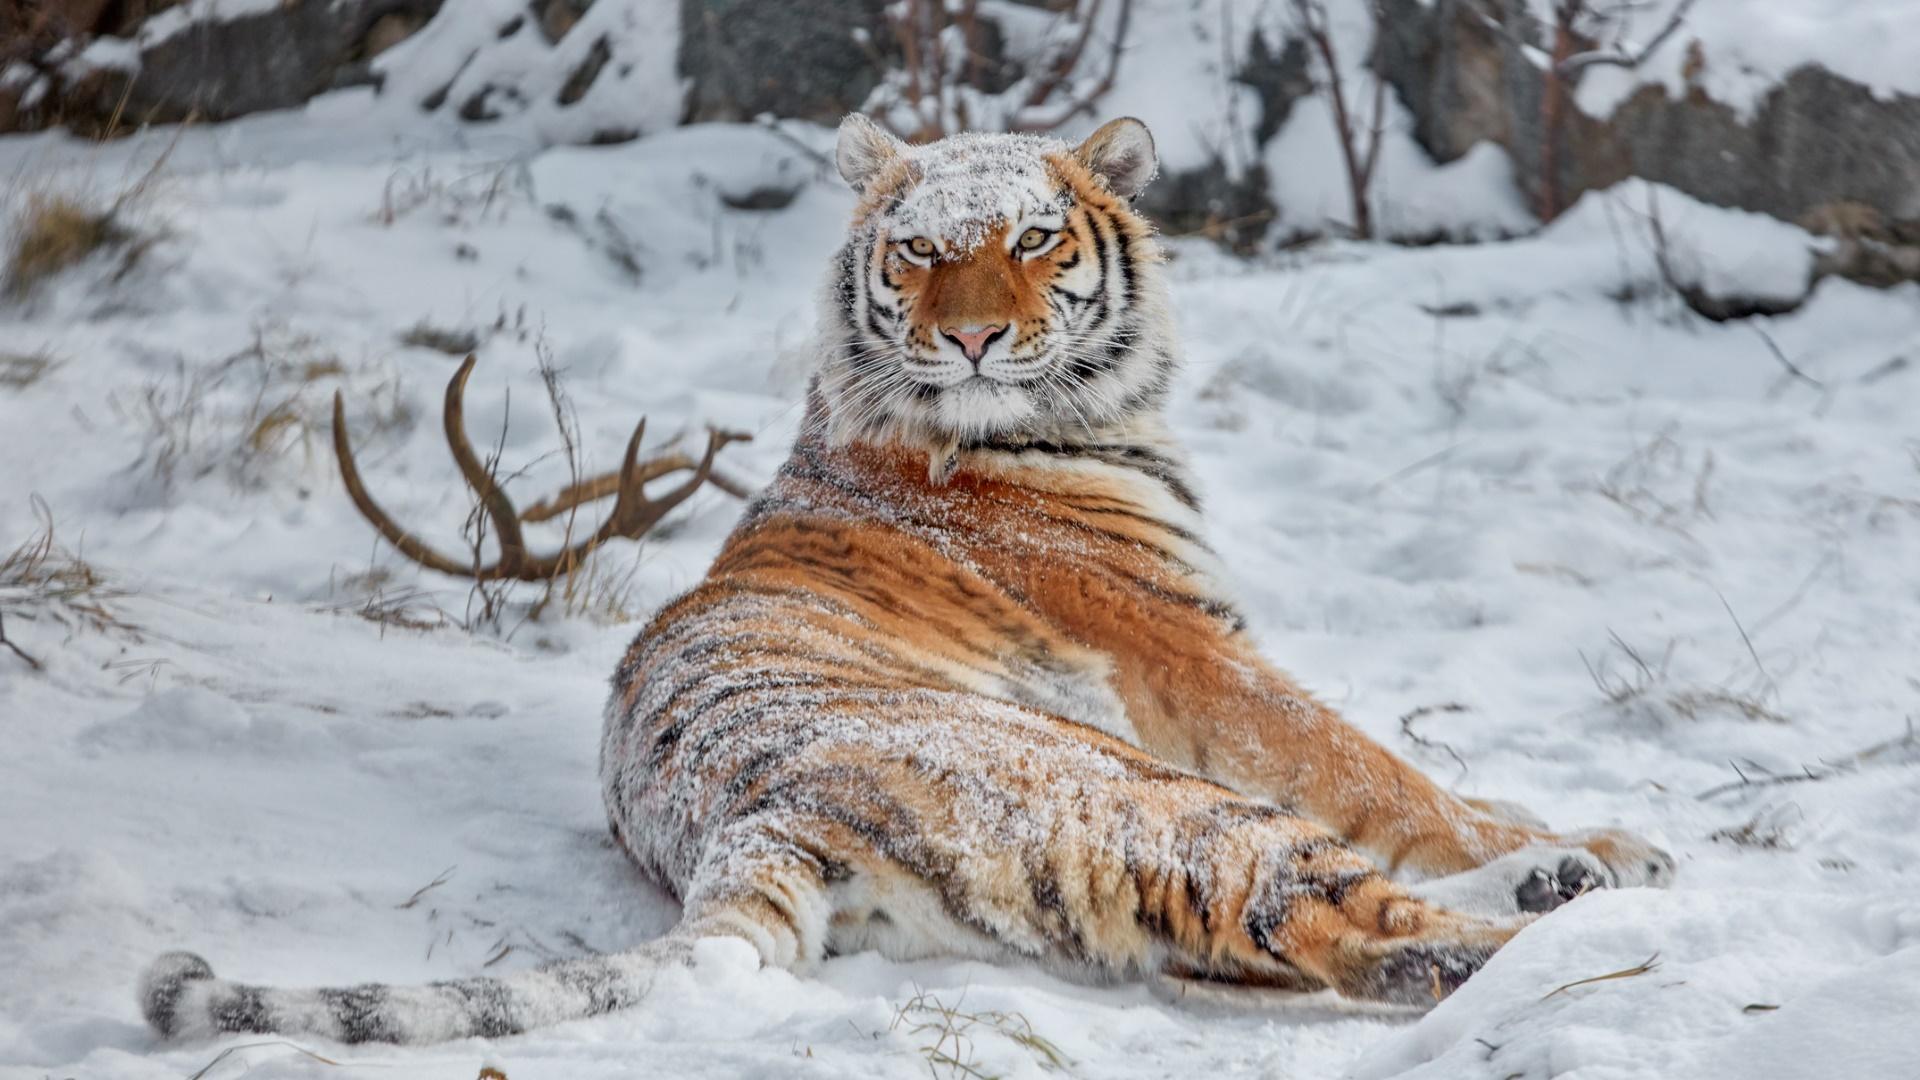 Wallpaper Siberian Tiger Snow Covered Animals Big Cats